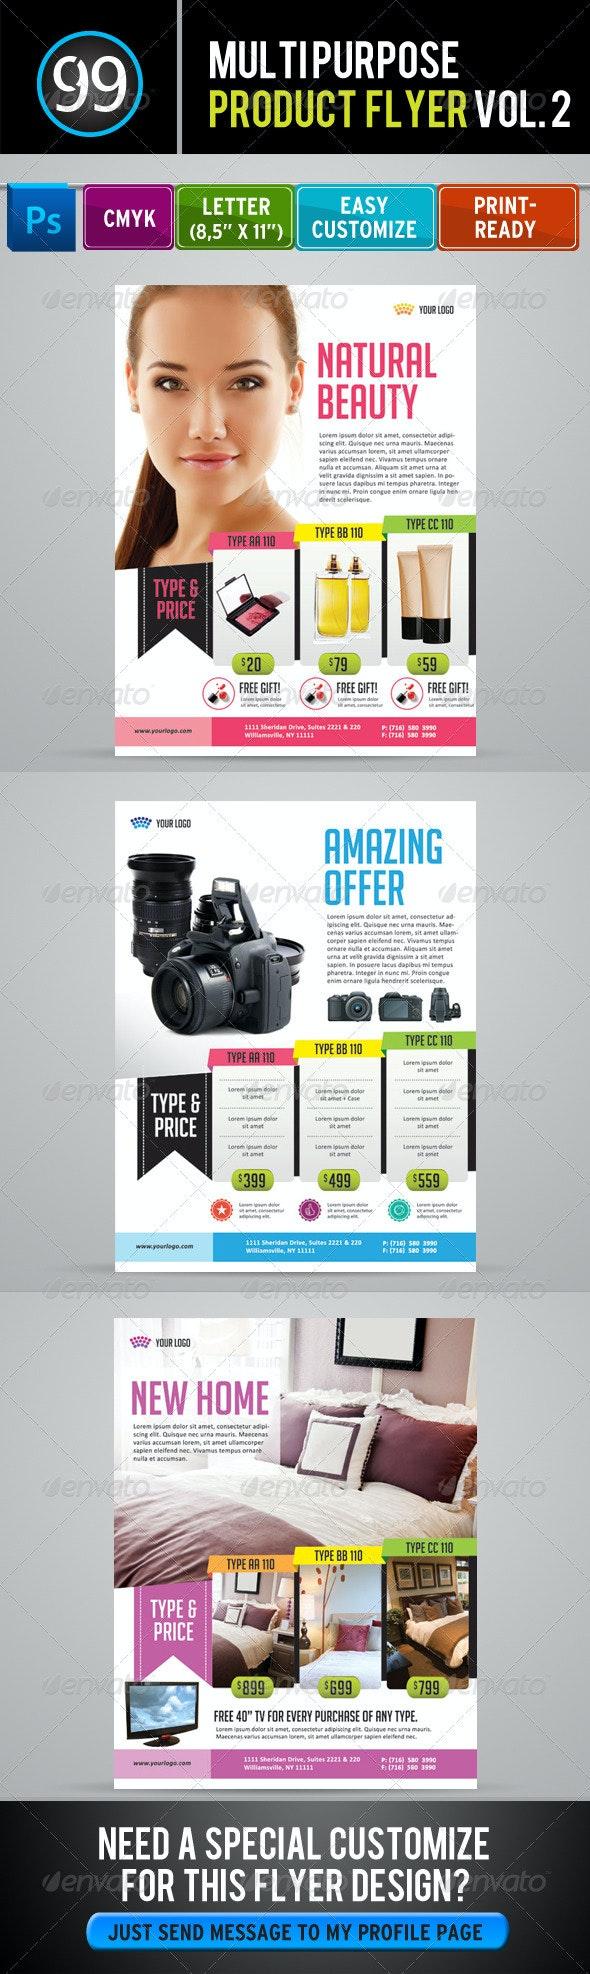 Promotion Flyer Vol 2 - Commerce Flyers